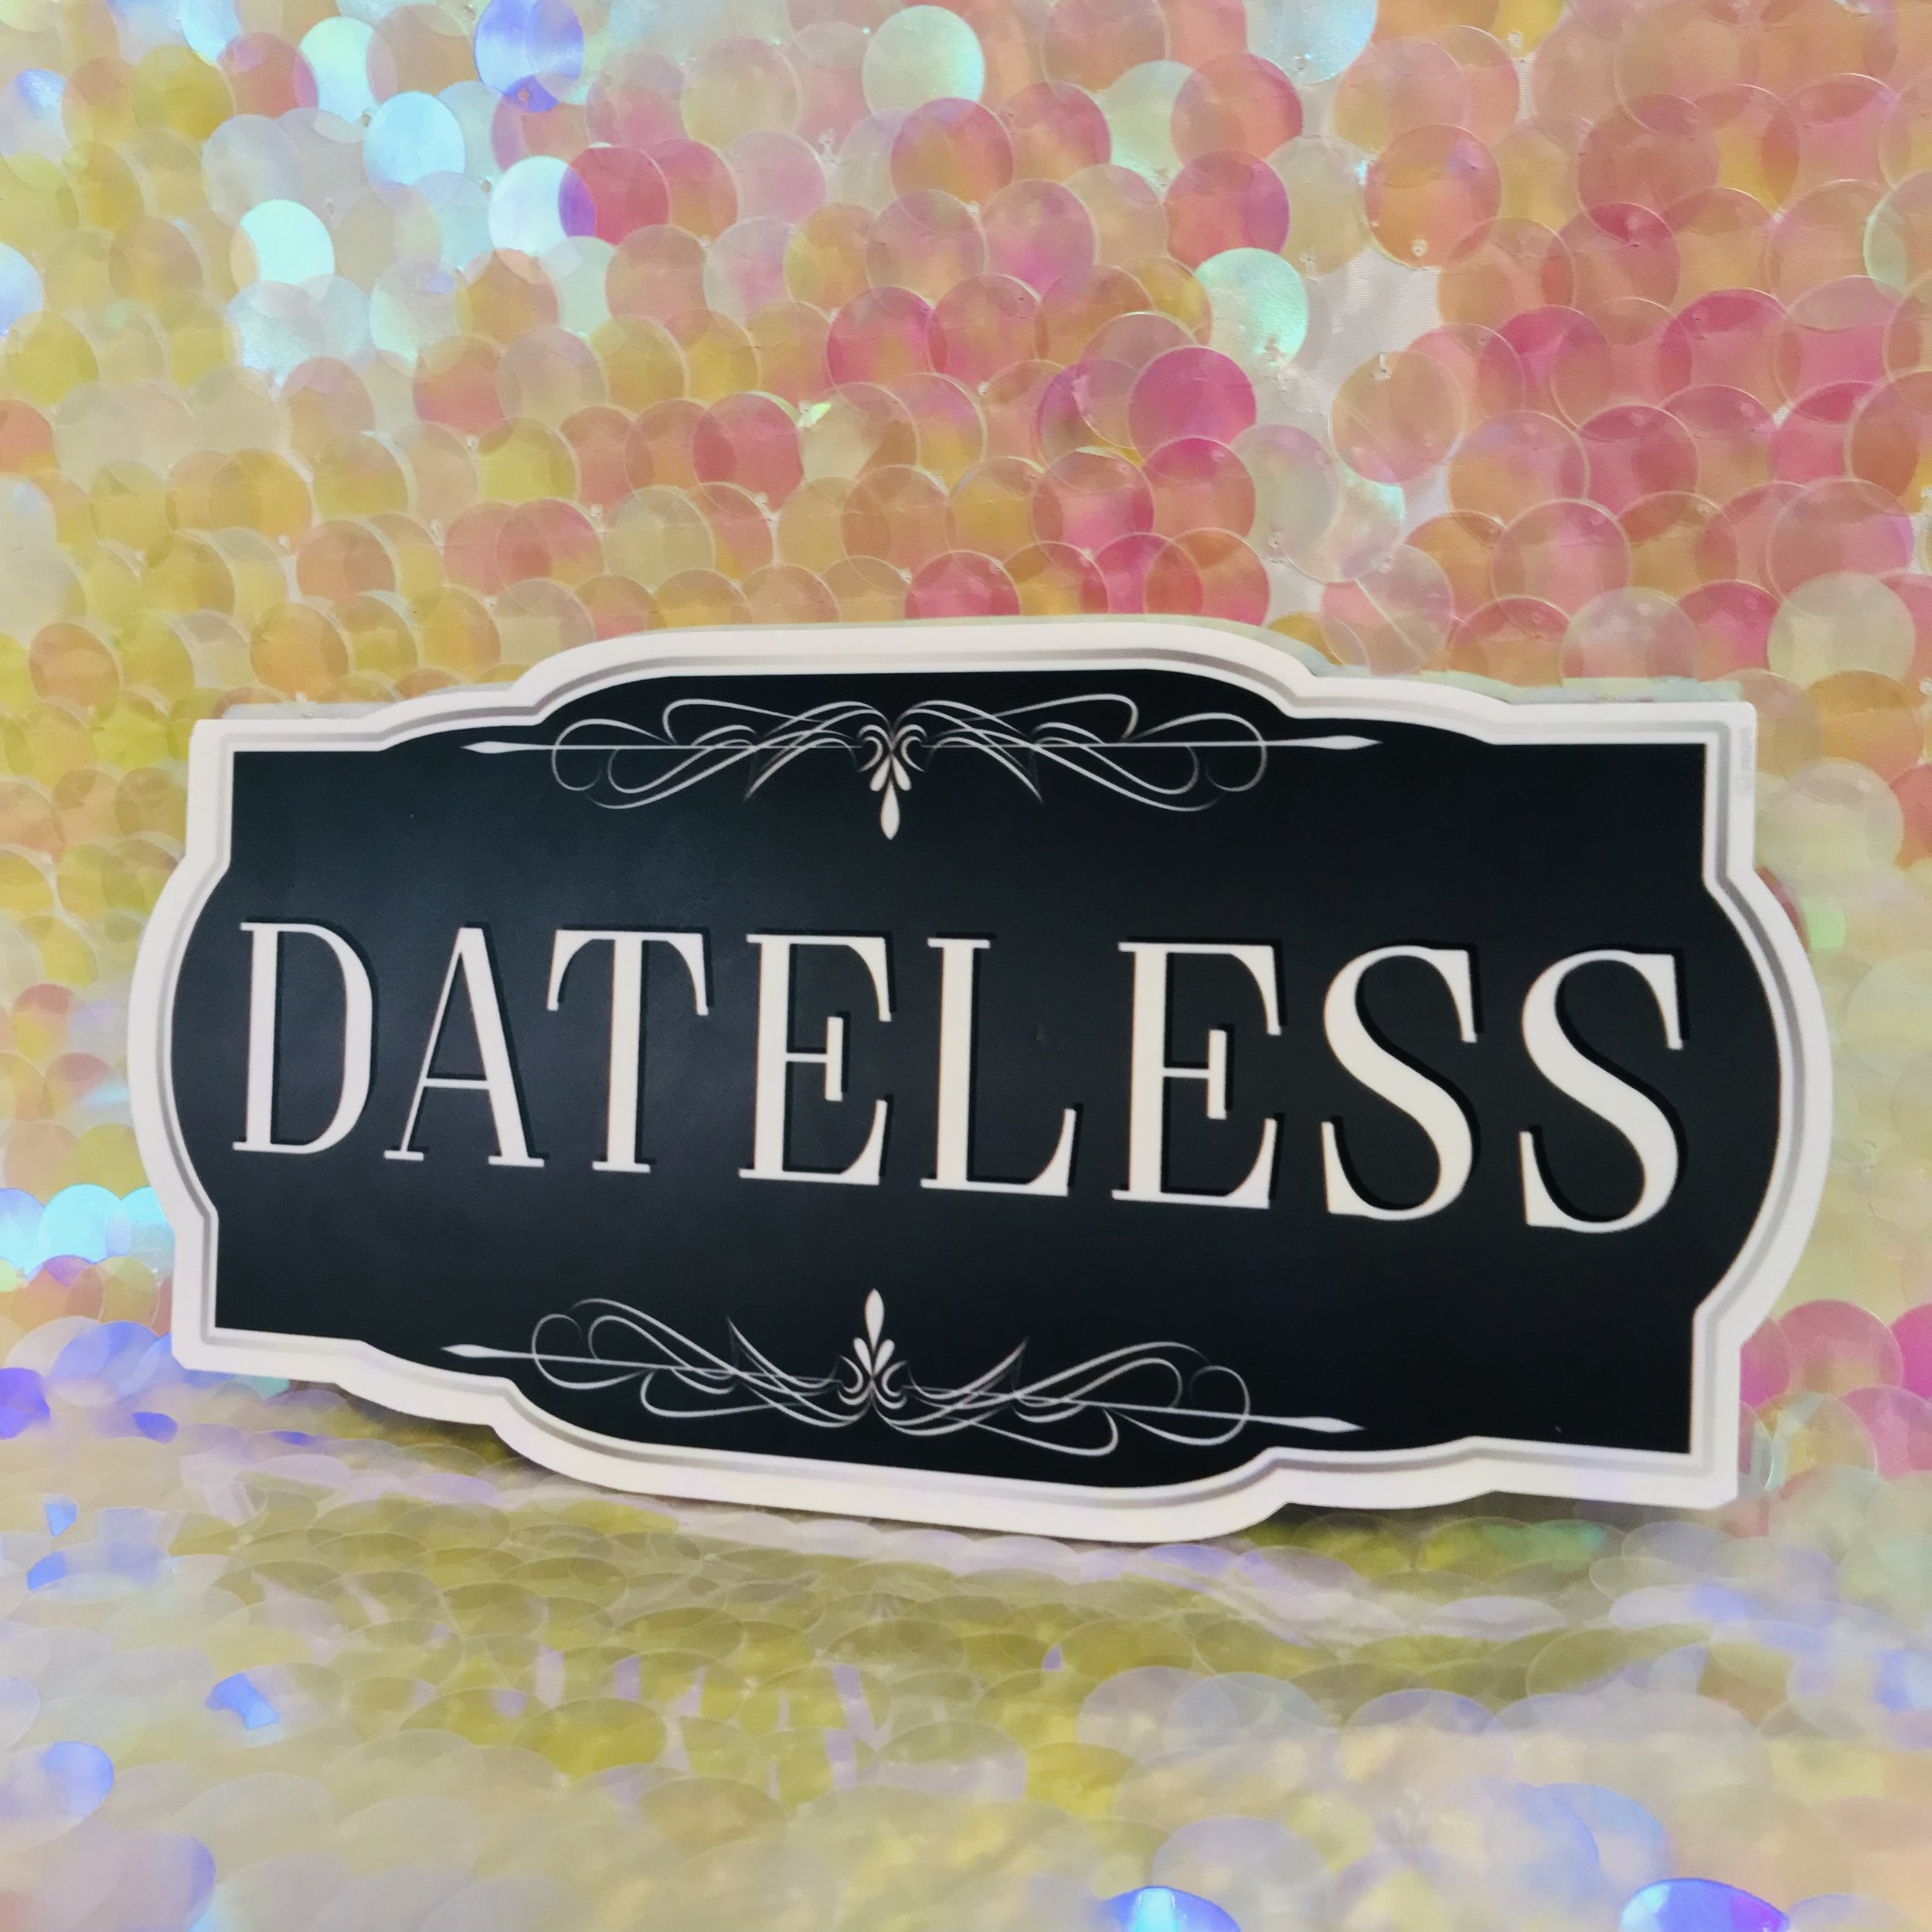 Dateless.jpg